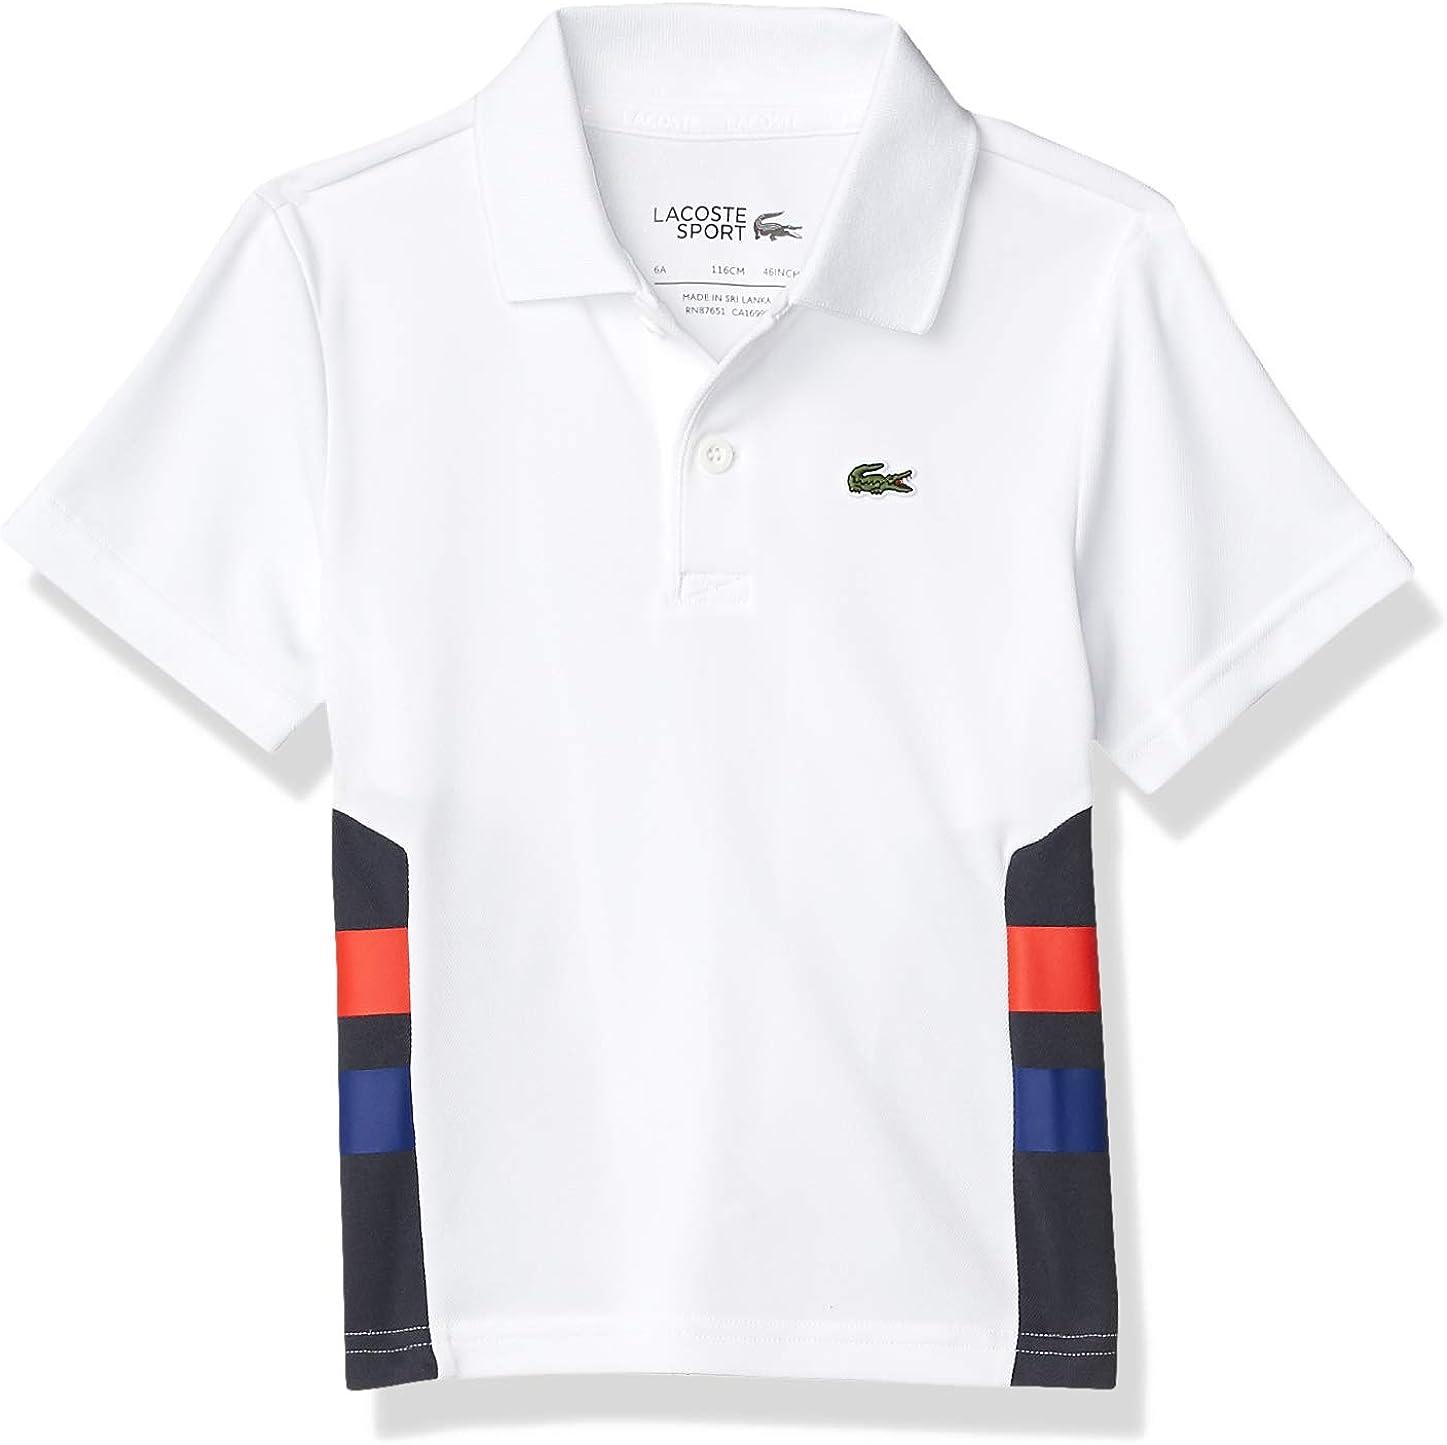 Lacoste Boys' Sport Striped Ultra Dry Polo Shirt